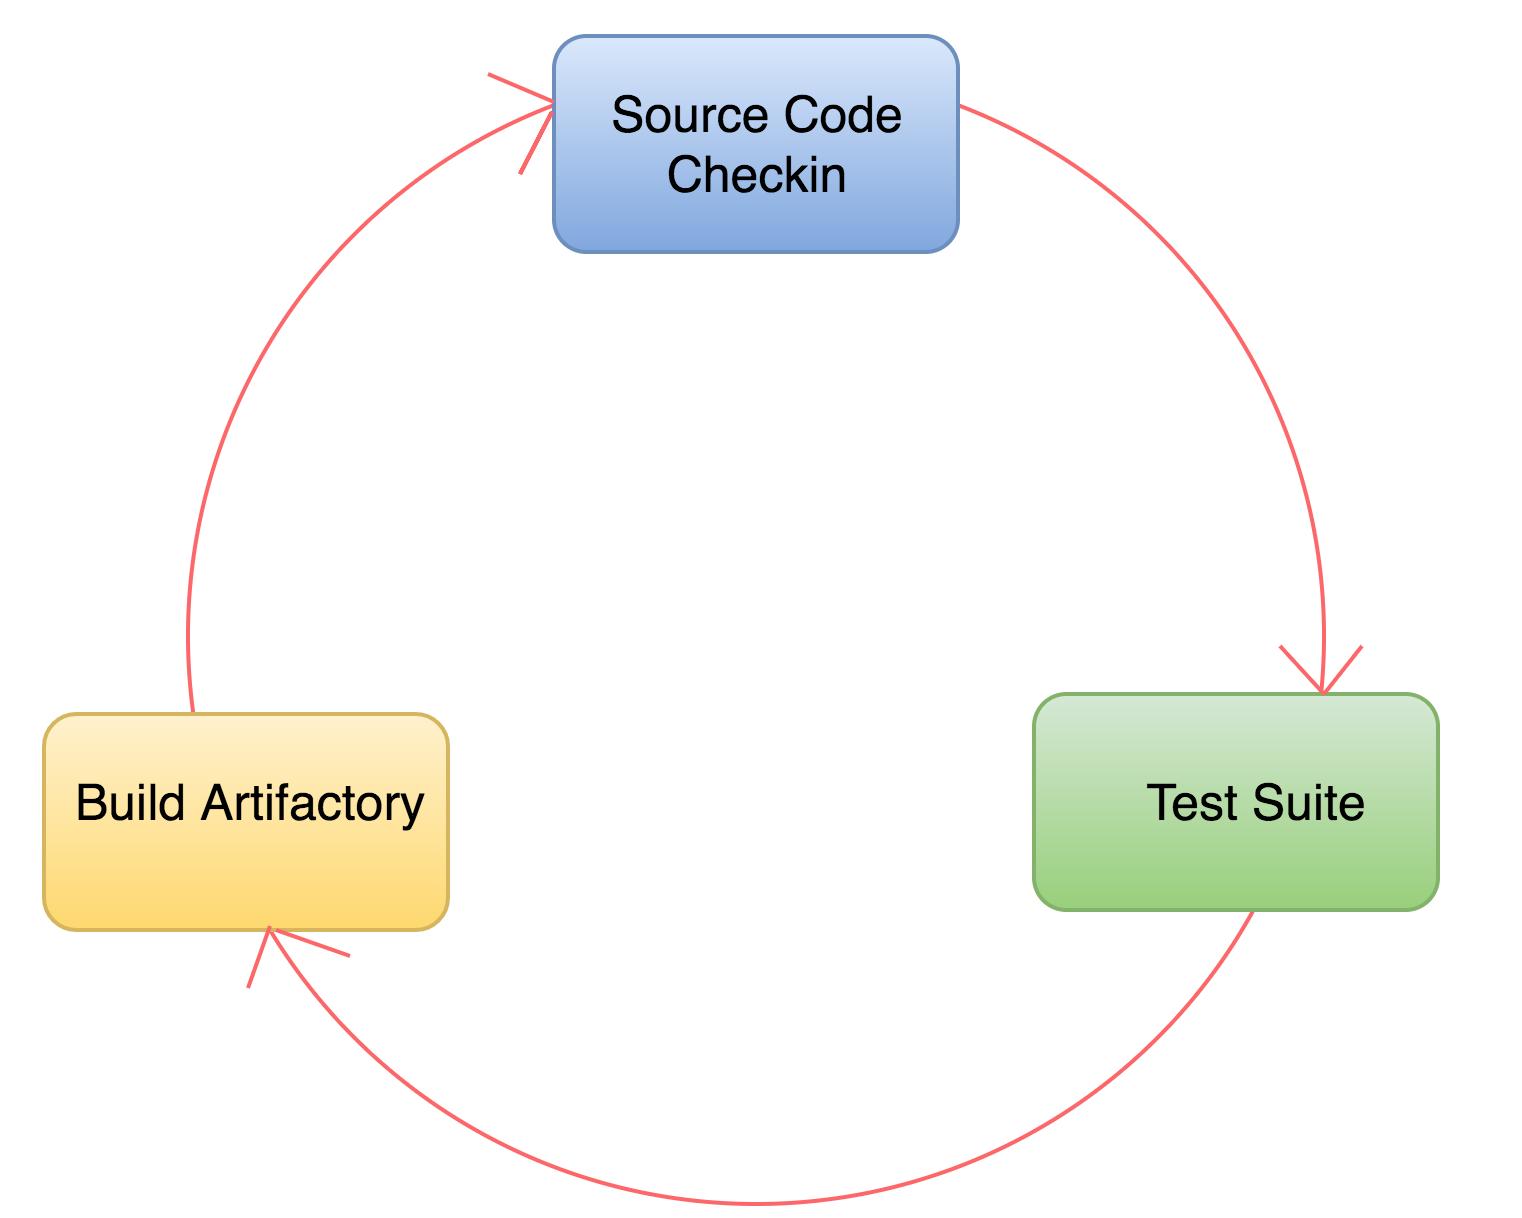 Fig. 2: Diagram of a continuous integration process